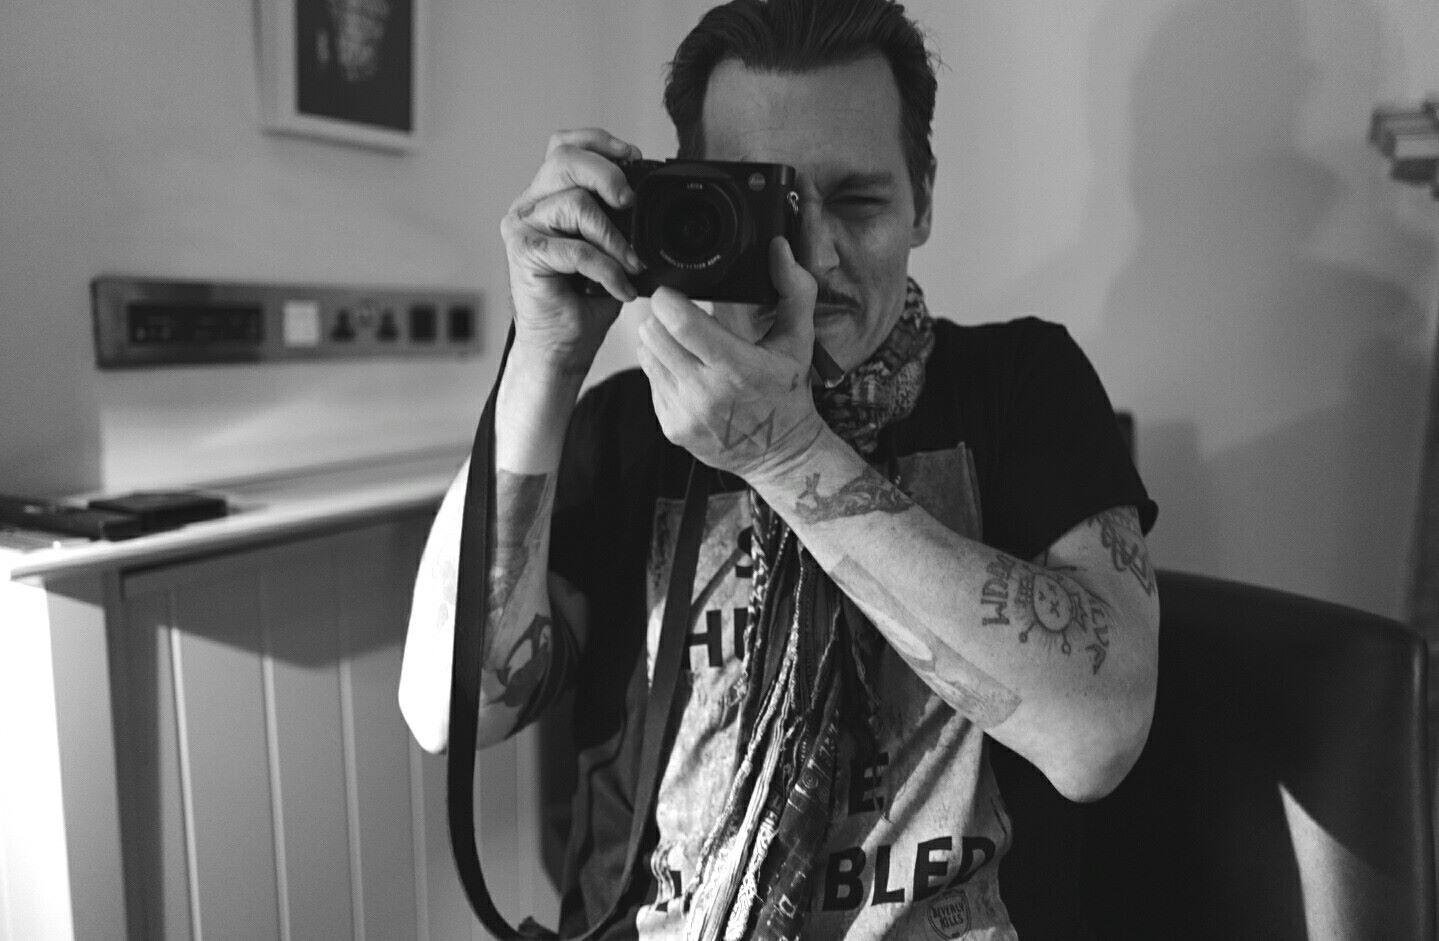 Johnny Depp Photoshoot 2016 Johnny Depp (2010 2017